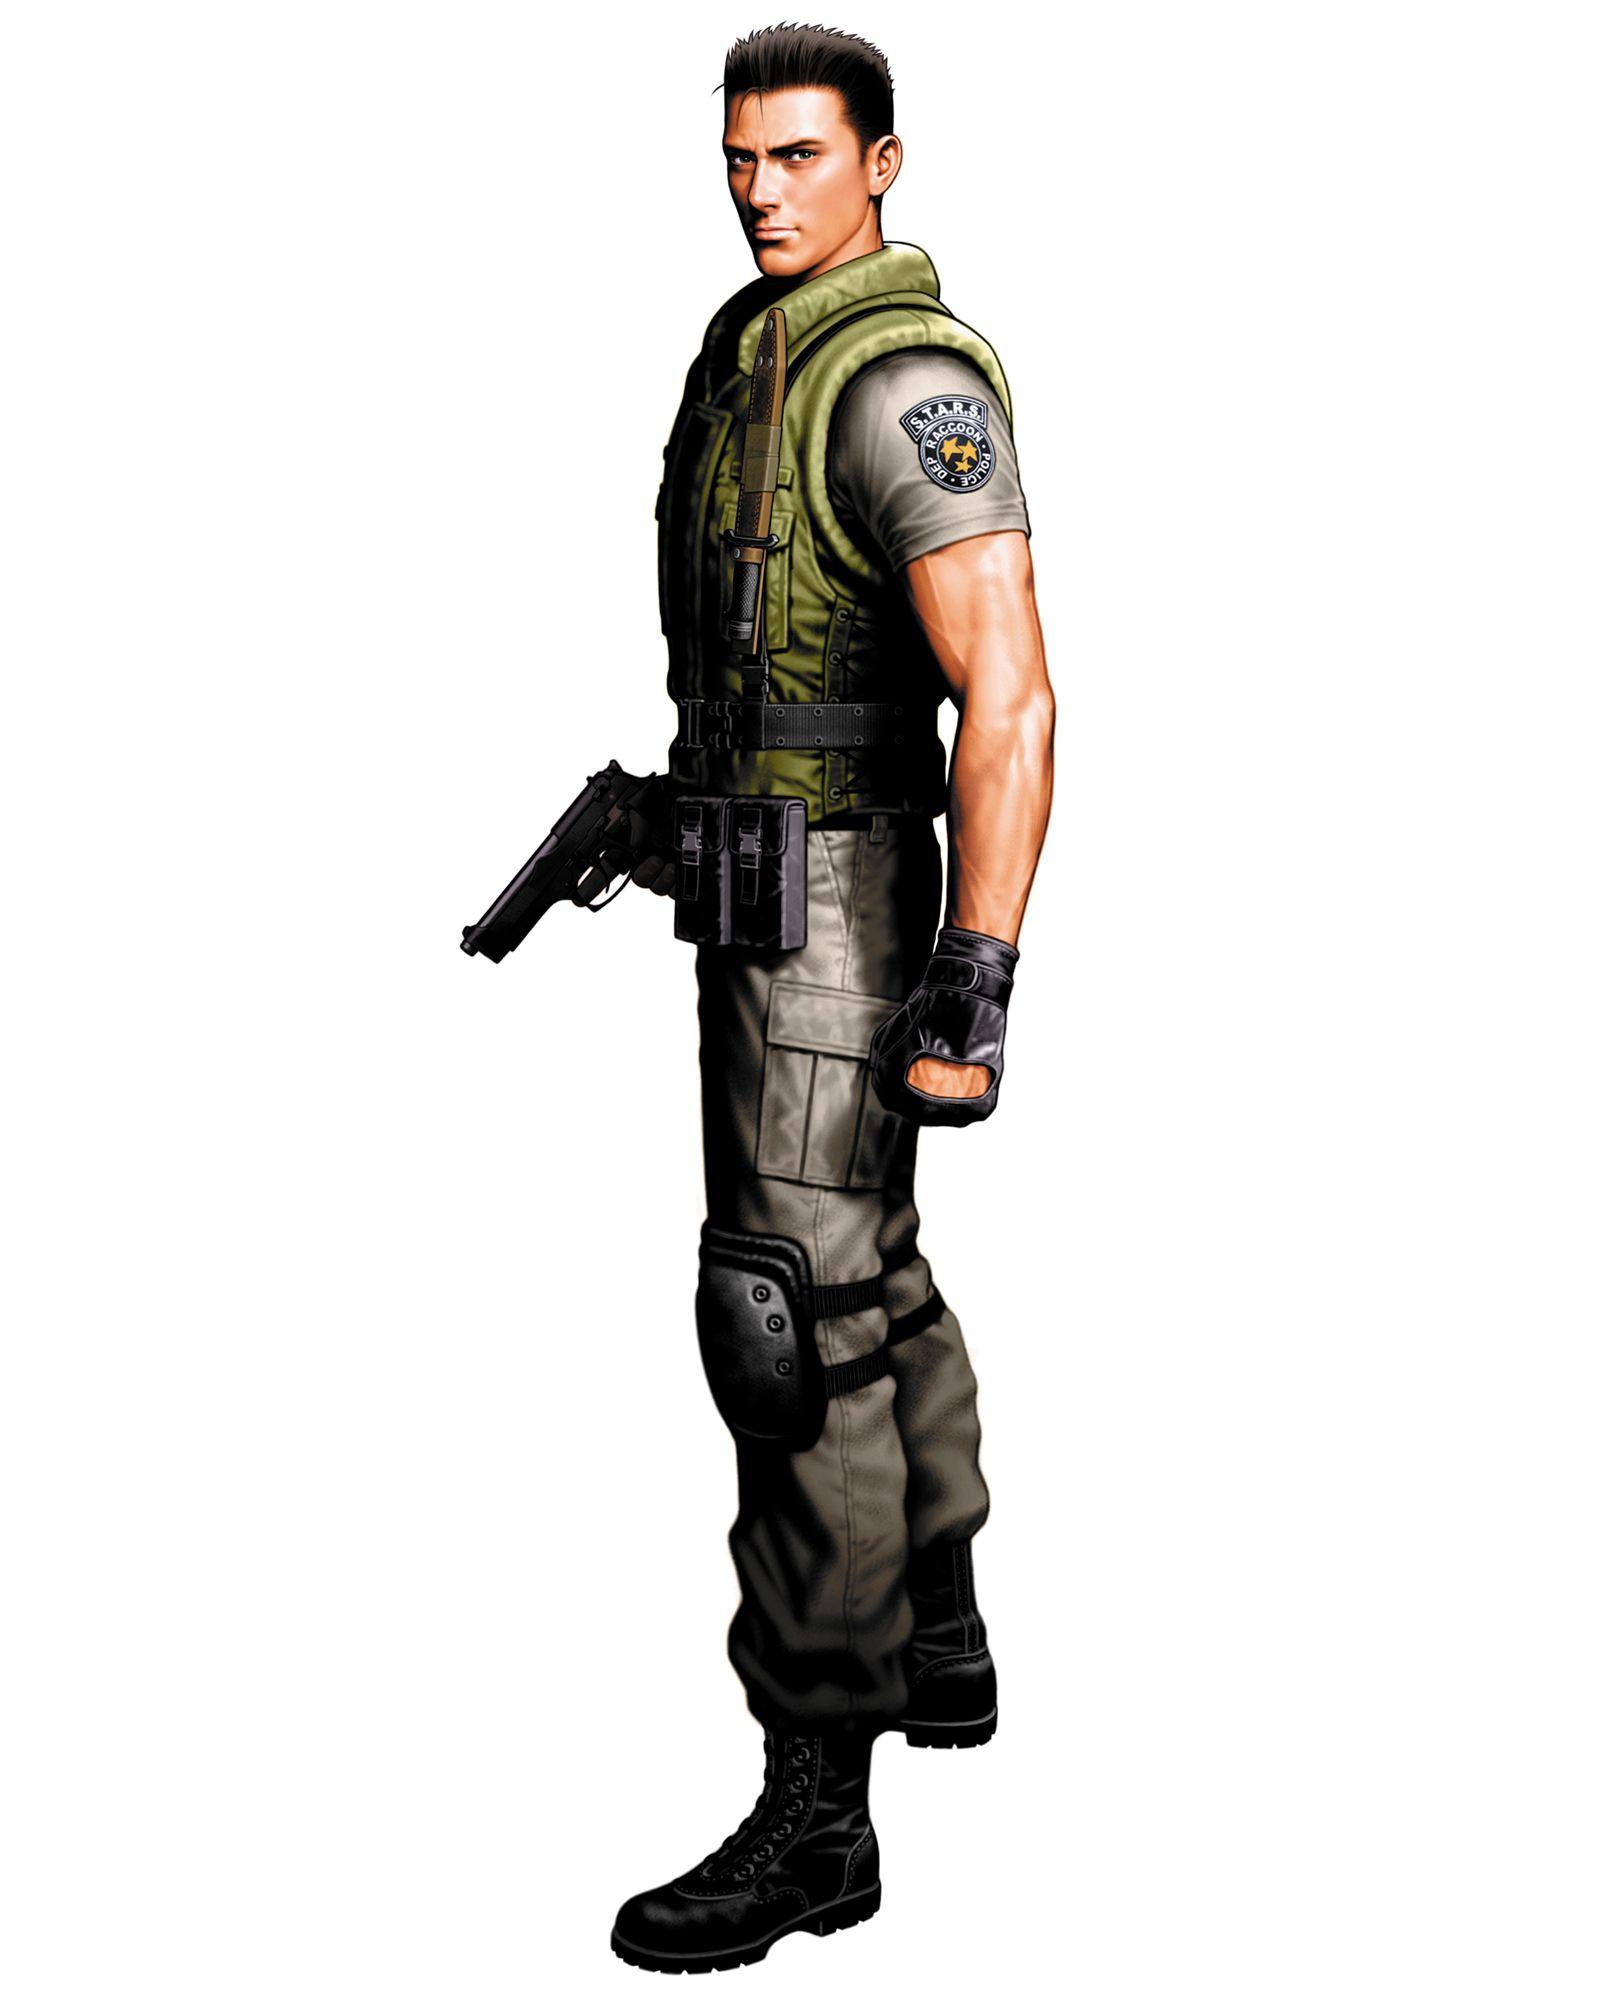 Chris Redfield Vs Mode Resident Evil Marvel Vs Capcom Evil